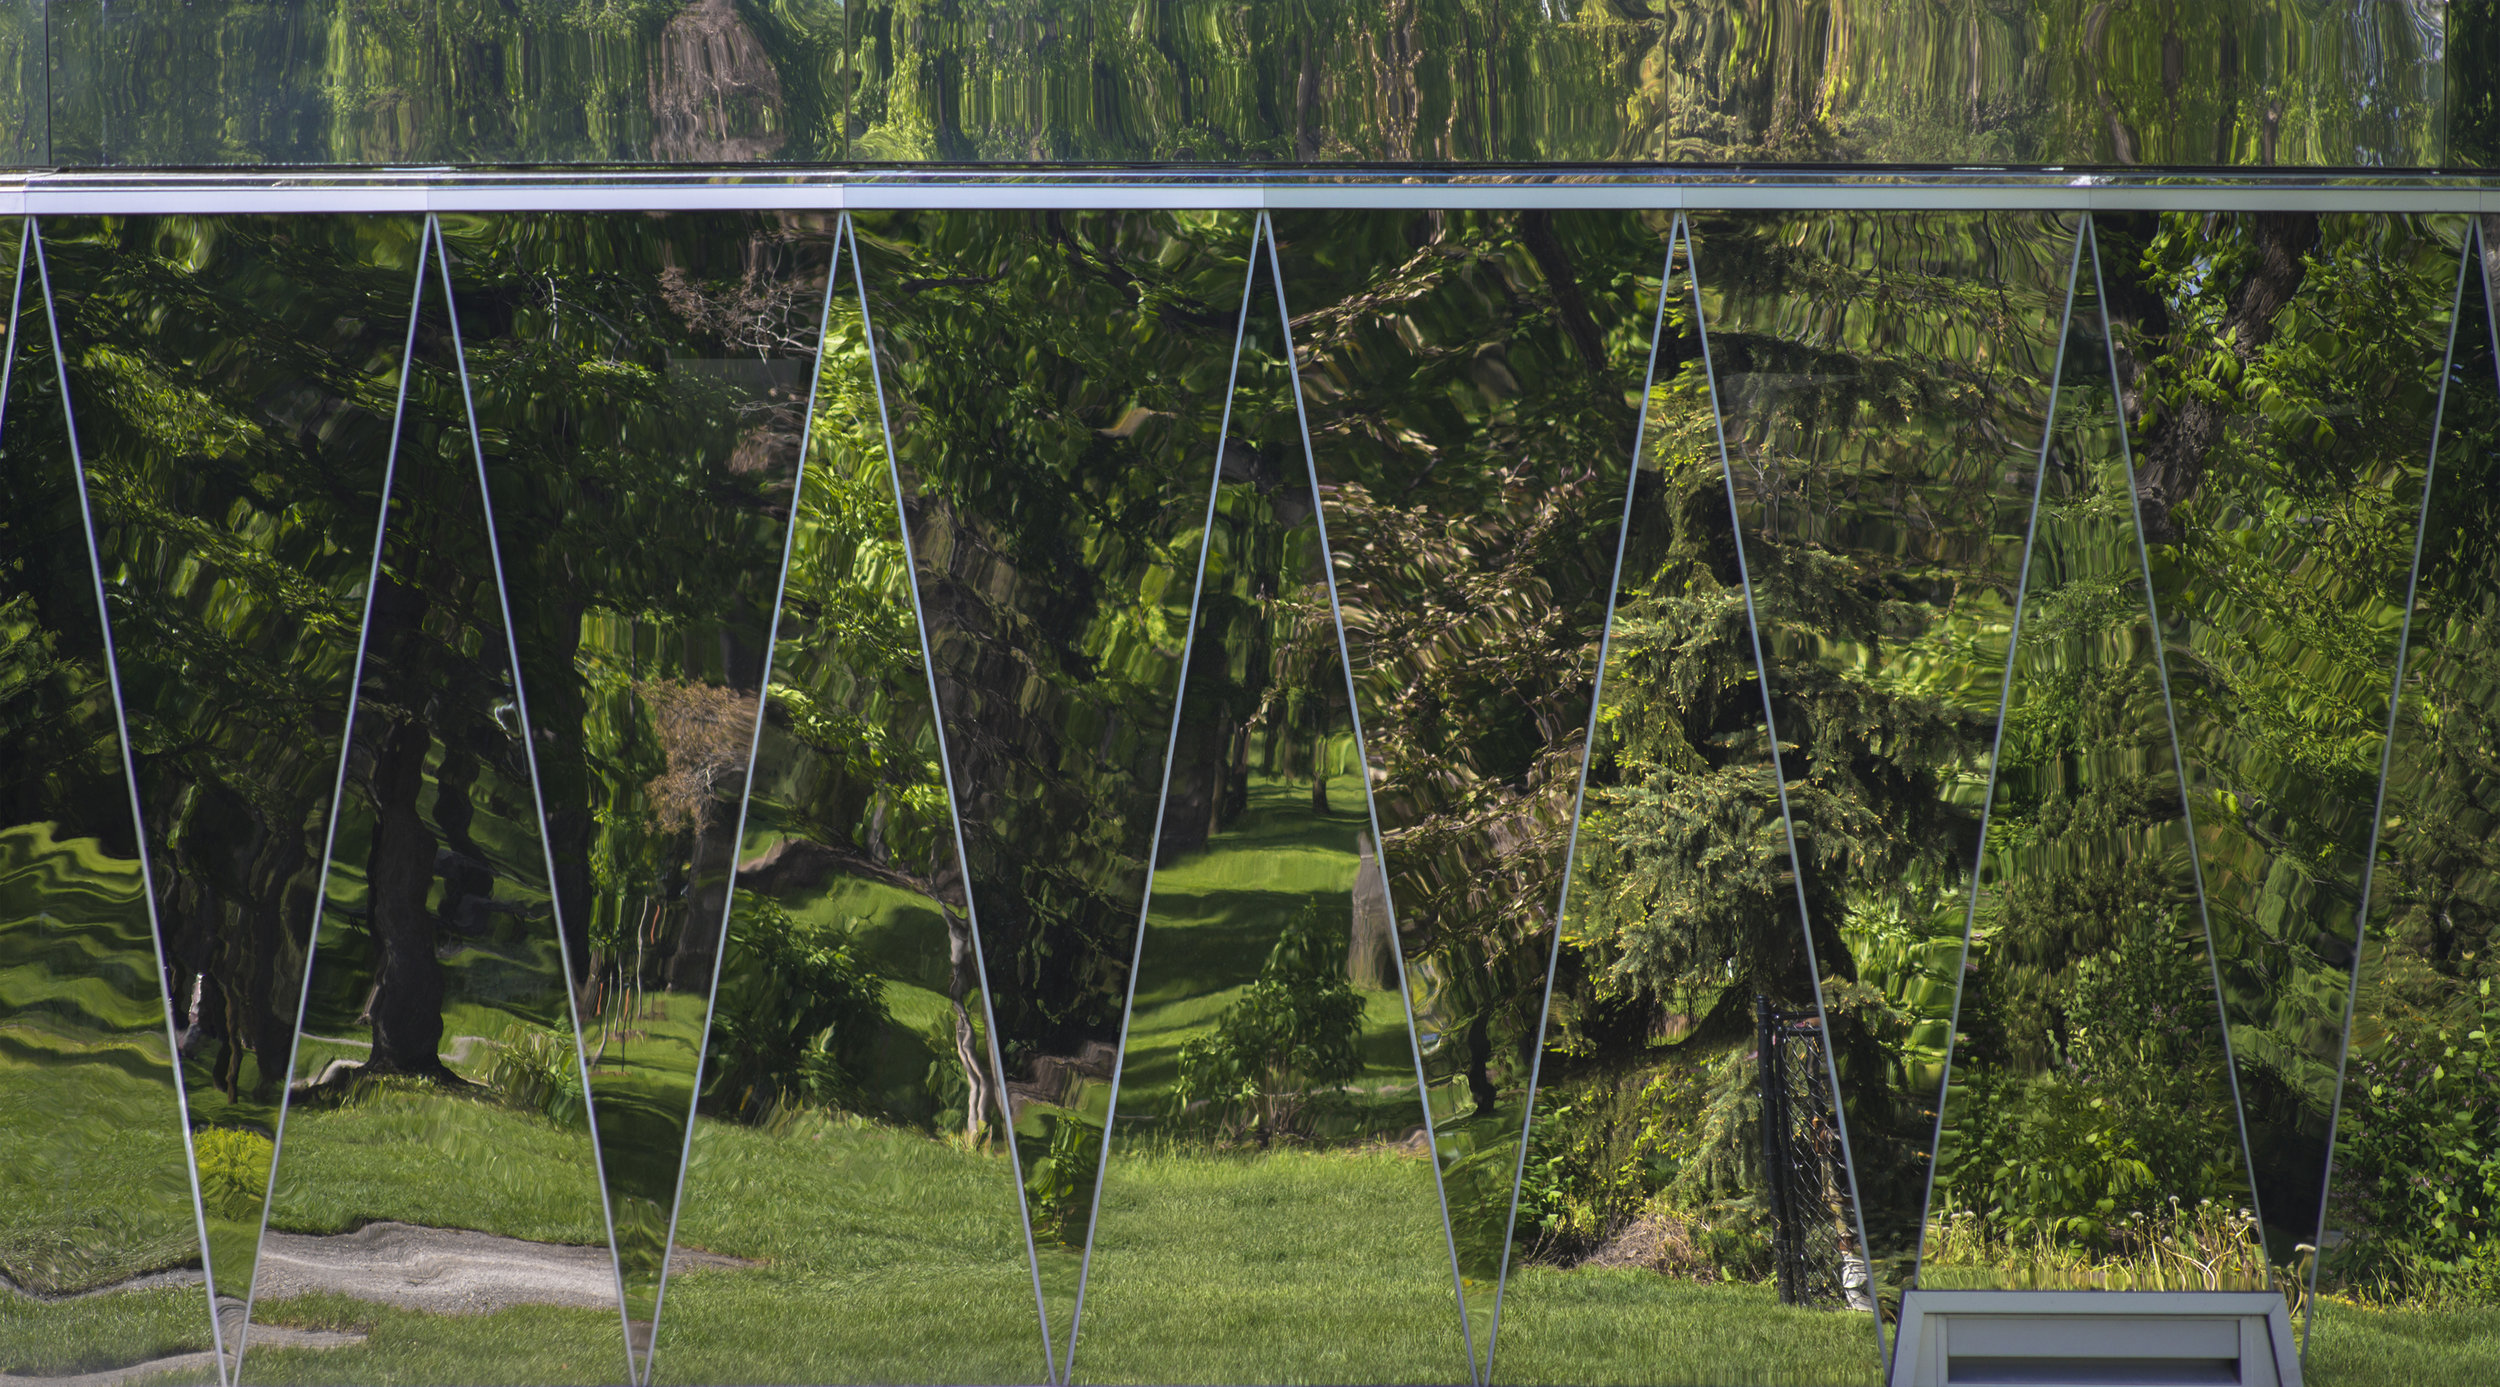 Borden Park Pavilion - mirrored glass facade elevation detail